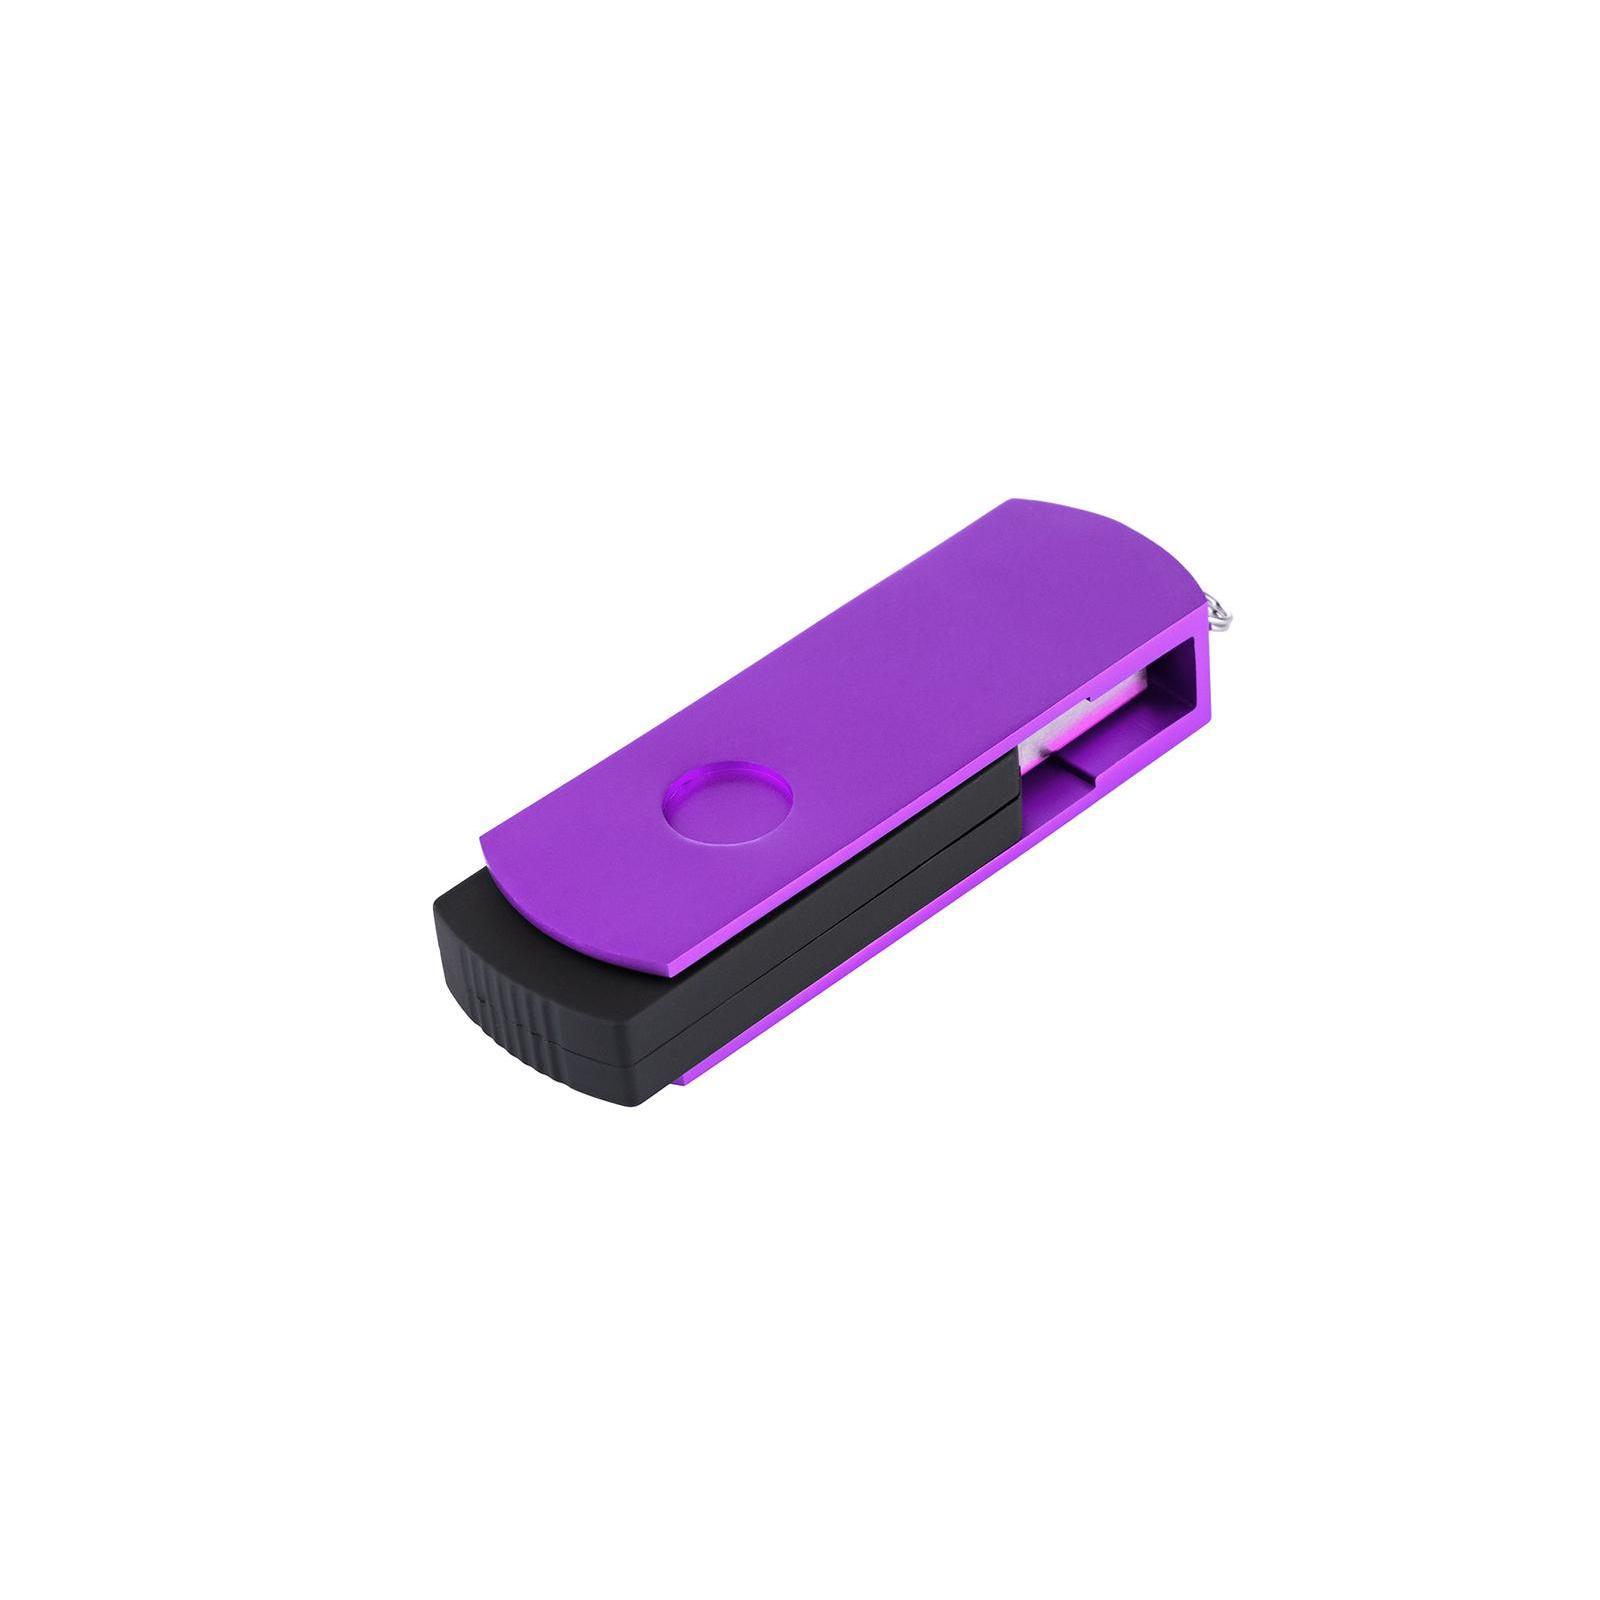 USB флеш накопитель eXceleram 32GB P2 Series White/Black USB 3.1 Gen 1 (EXP2U3WHB32) изображение 6